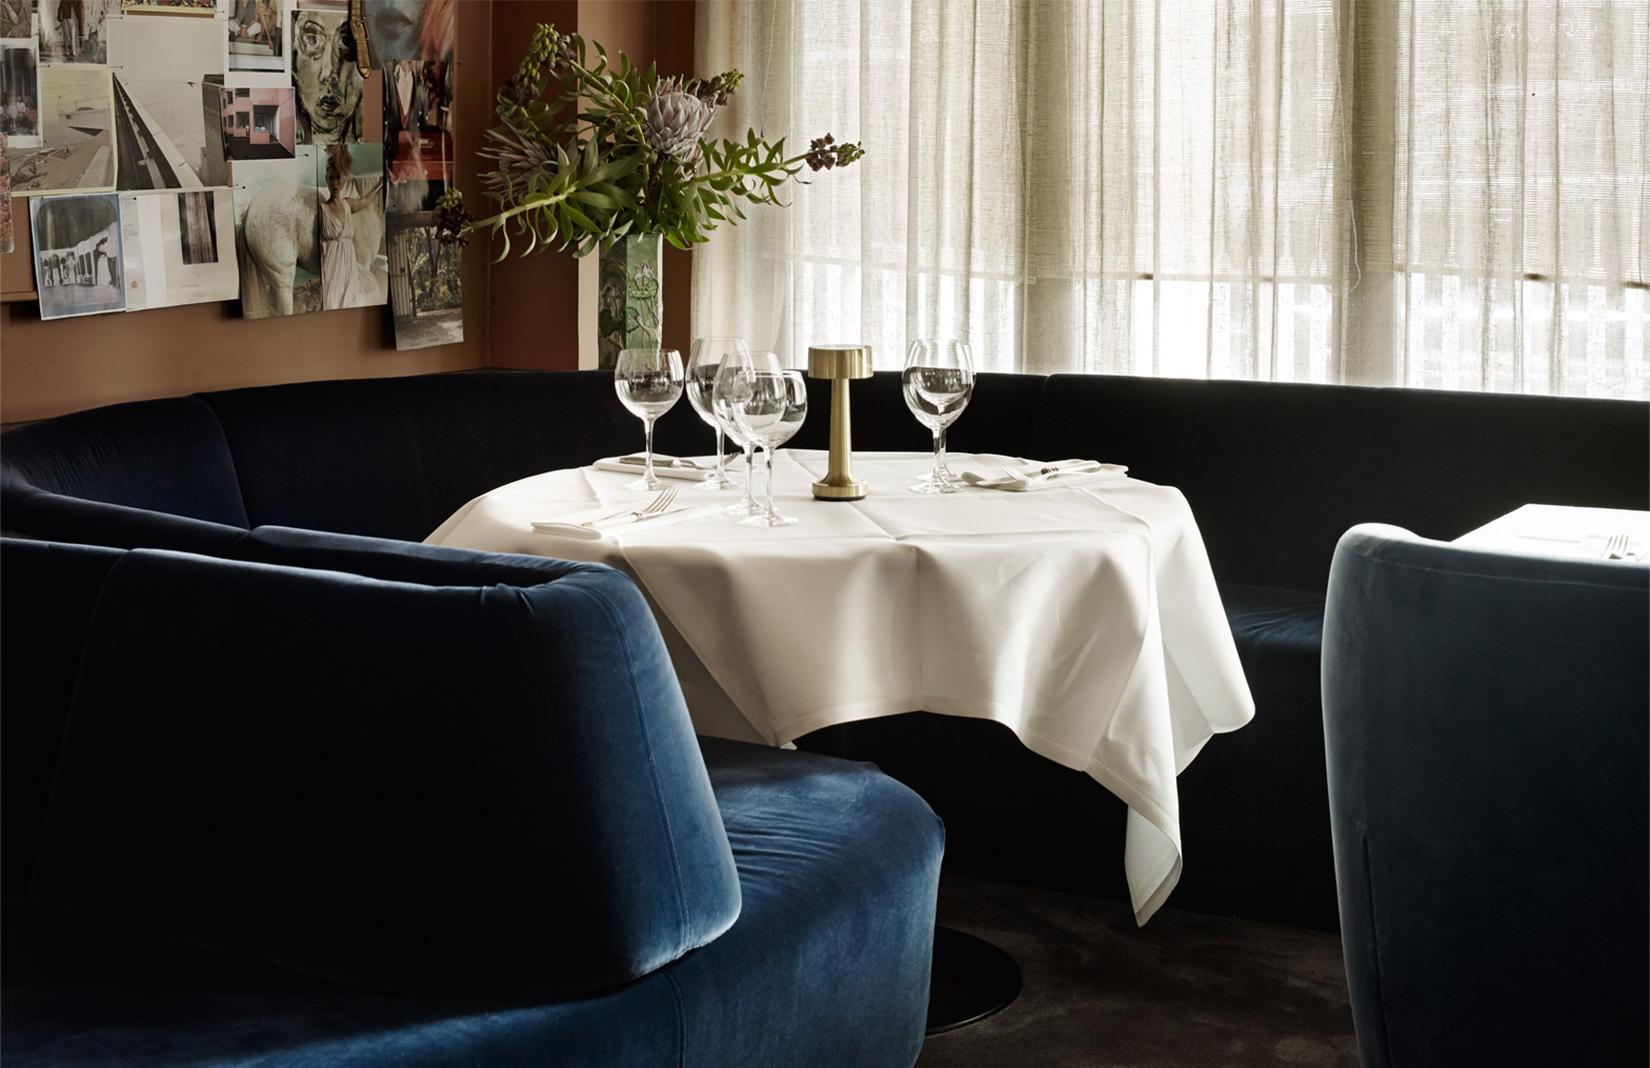 LouLou restaurant Photography: Joachim Wichmann